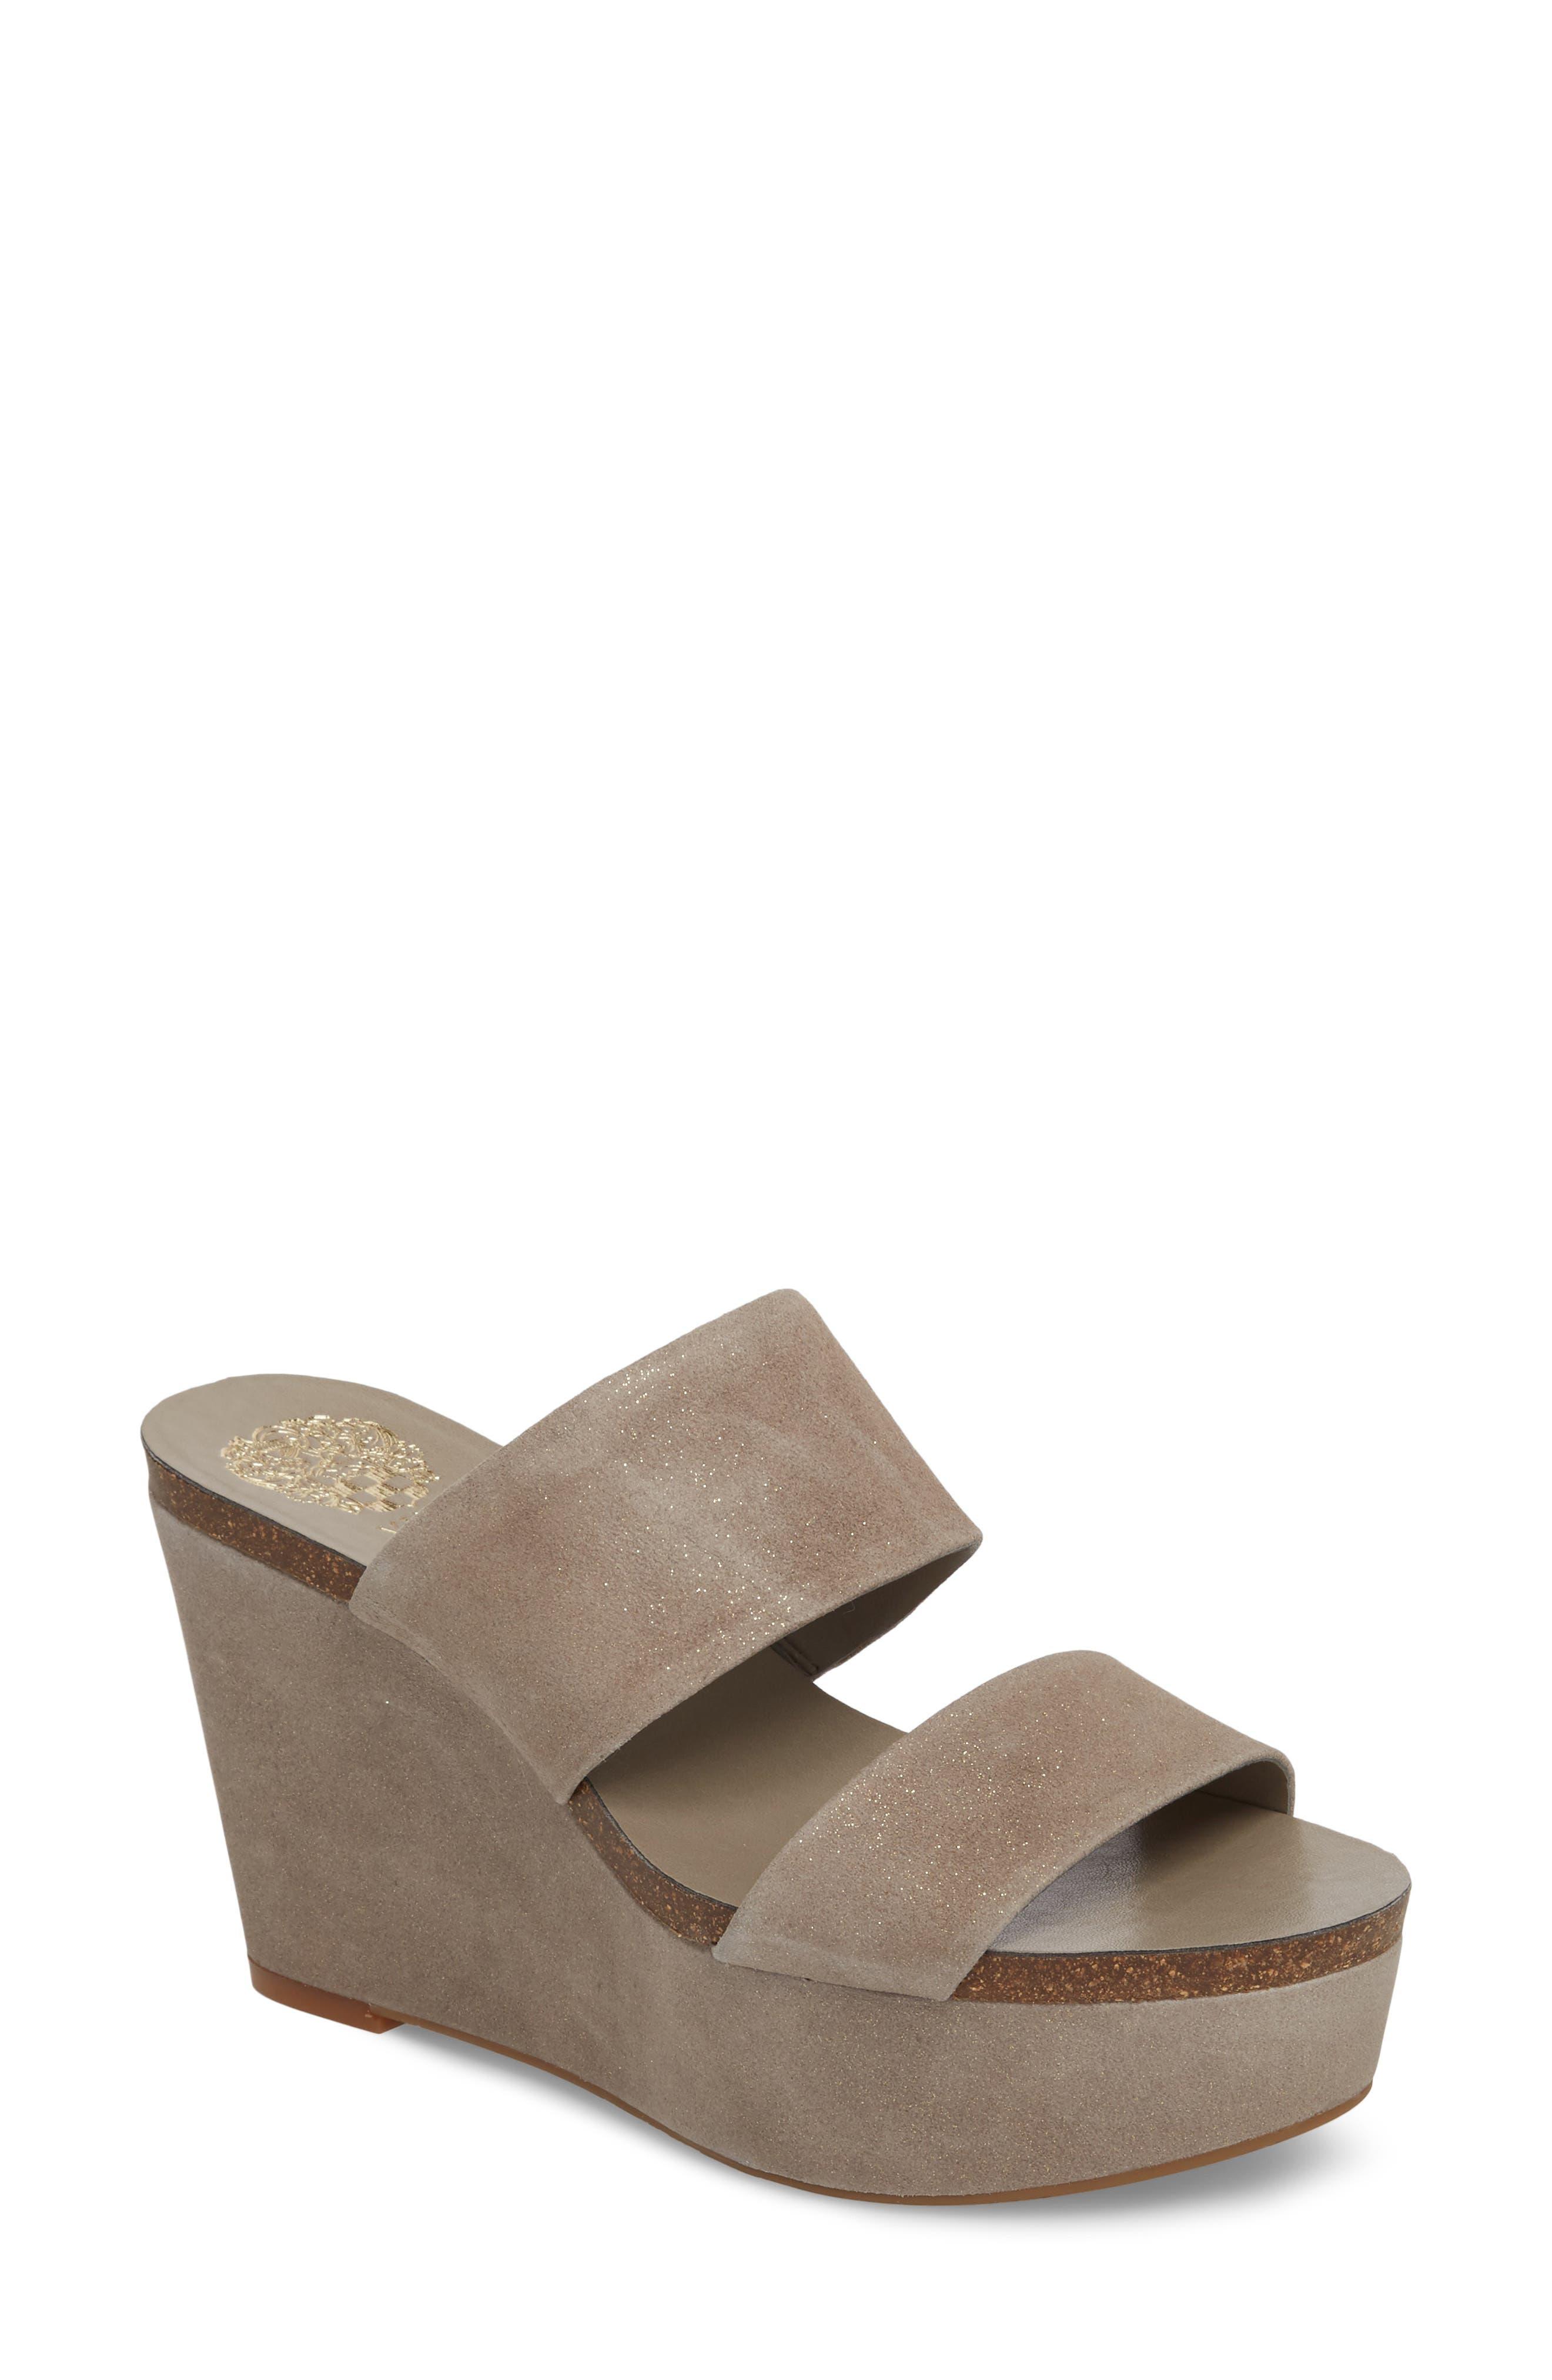 Varenia Platform Wedge Sandal,                         Main,                         color, SILVER GREY FABRIC